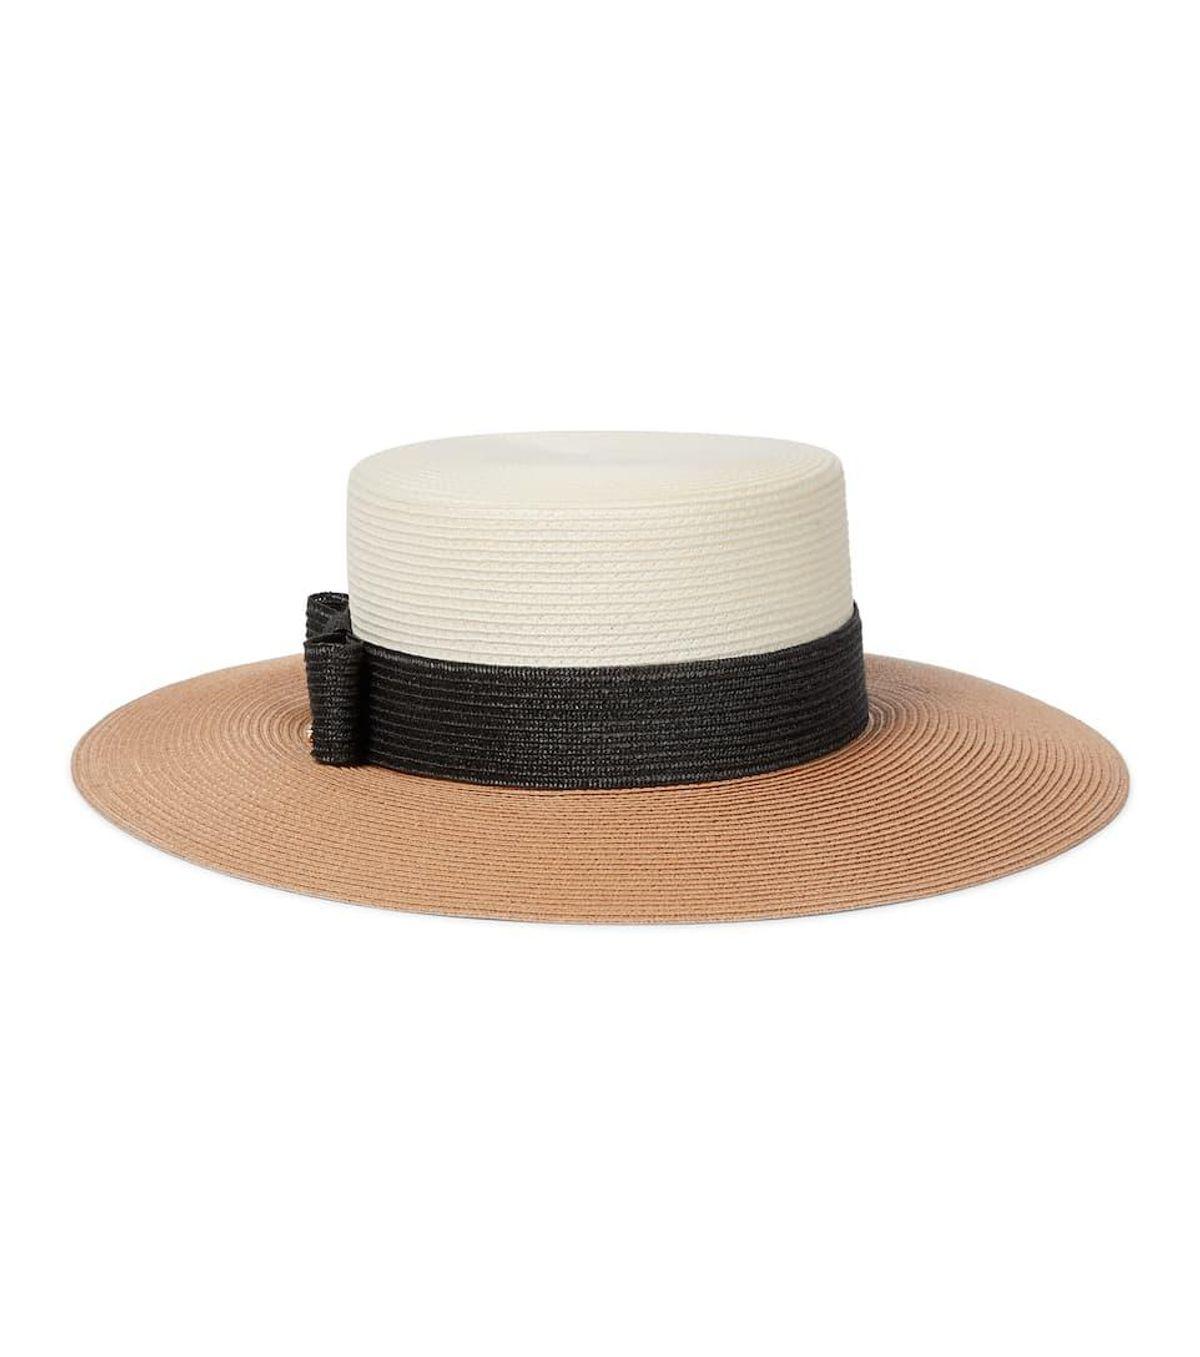 Straw-effect Hat